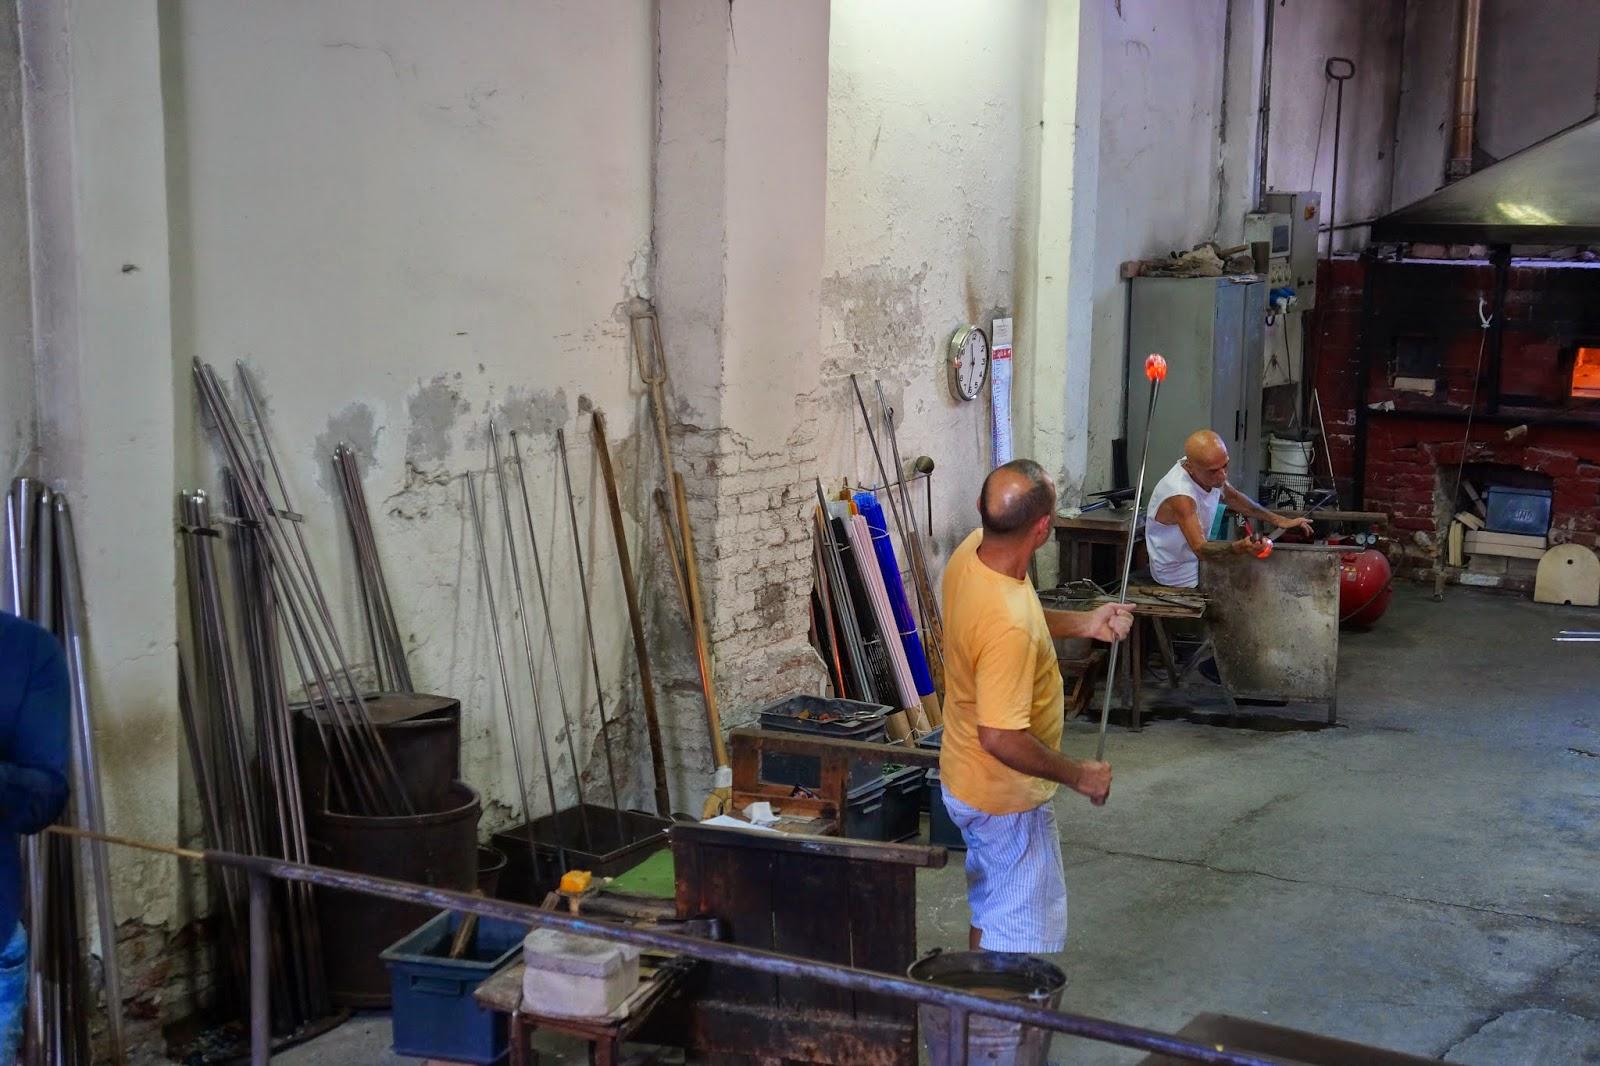 Glassfactory in Murano, Venezia.